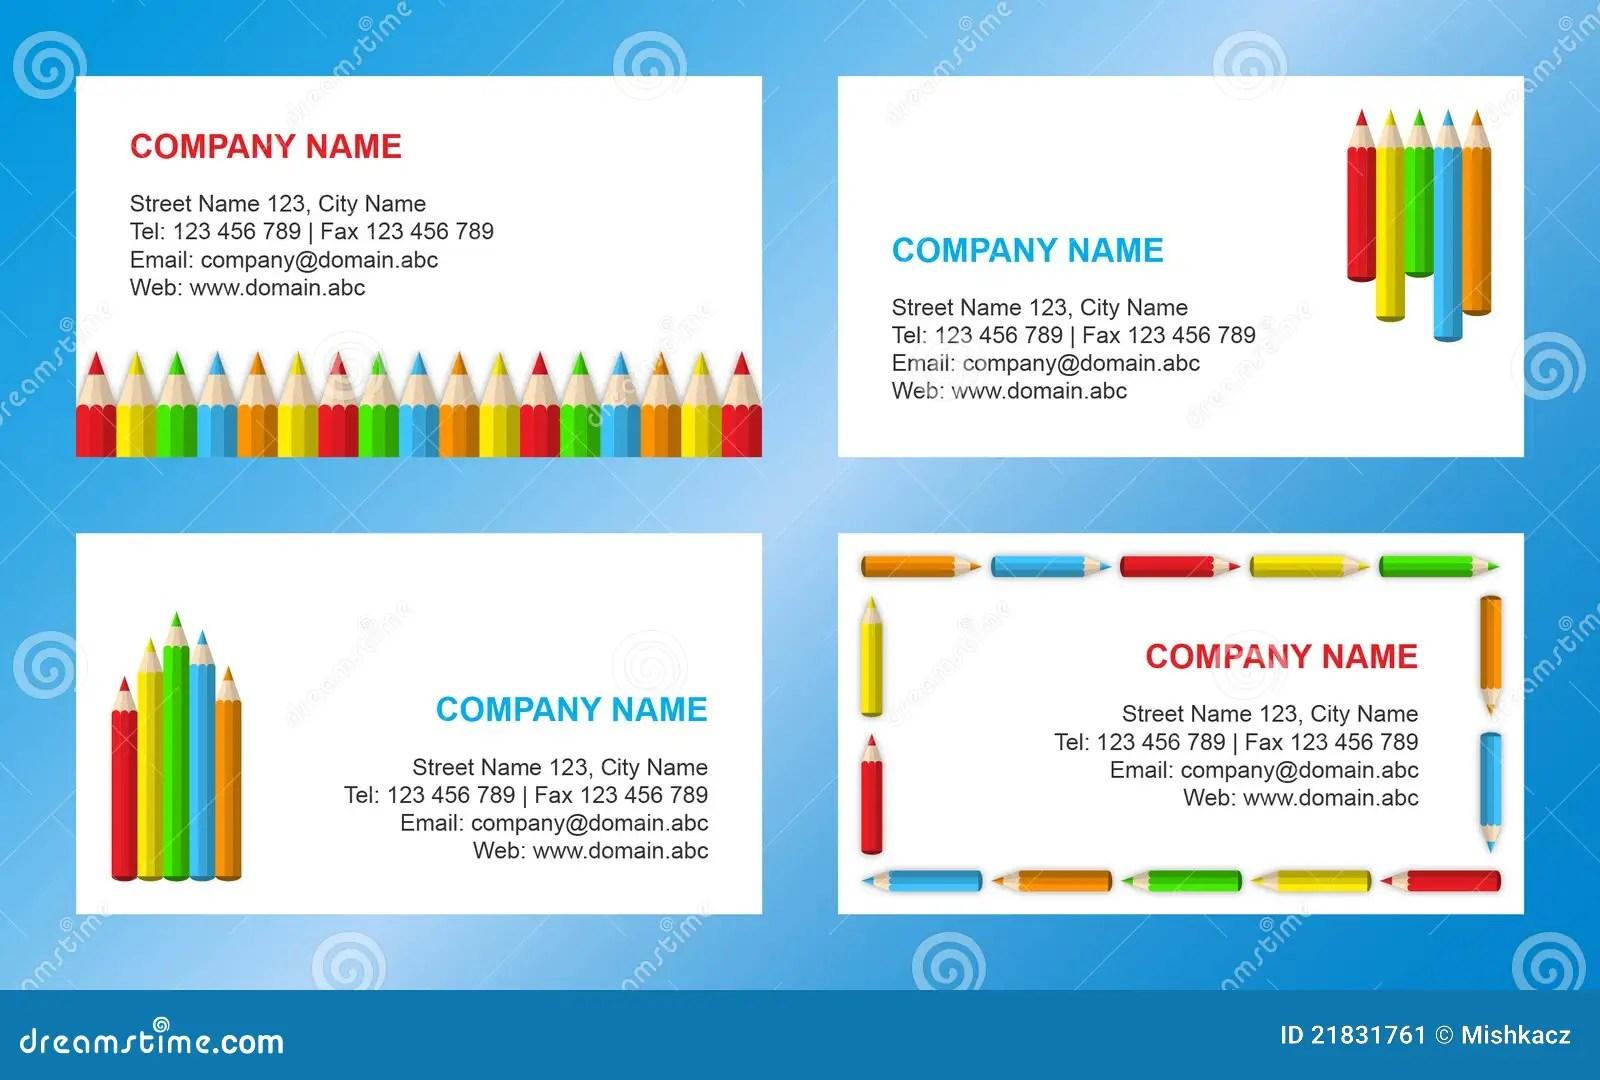 Crayons Business Card Template Stock Image